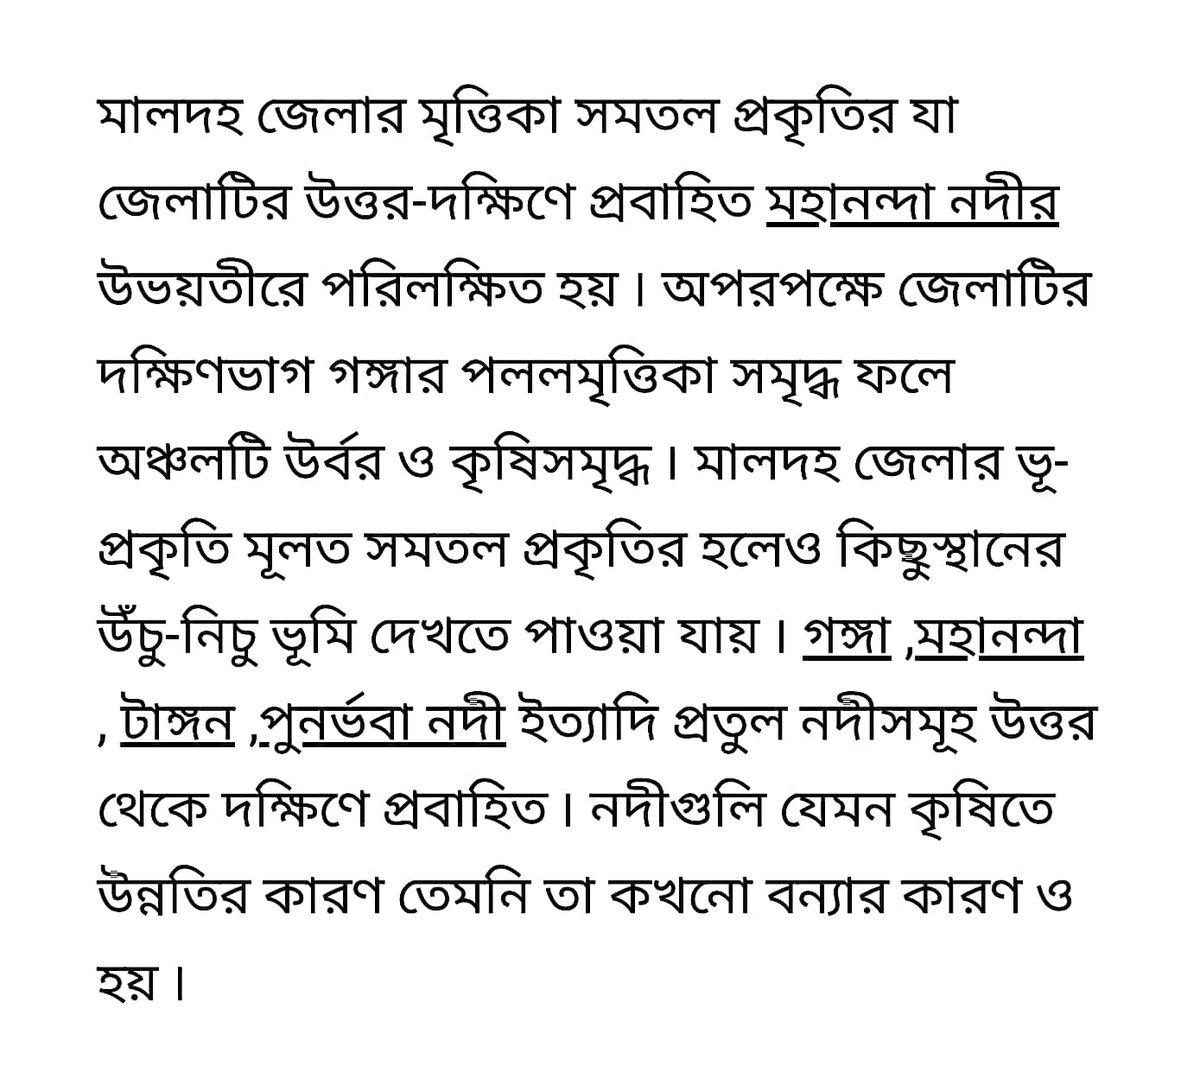 #malda #kolkata #indea #bangladesh #nepal https://t.co/EPbyqbKVOo